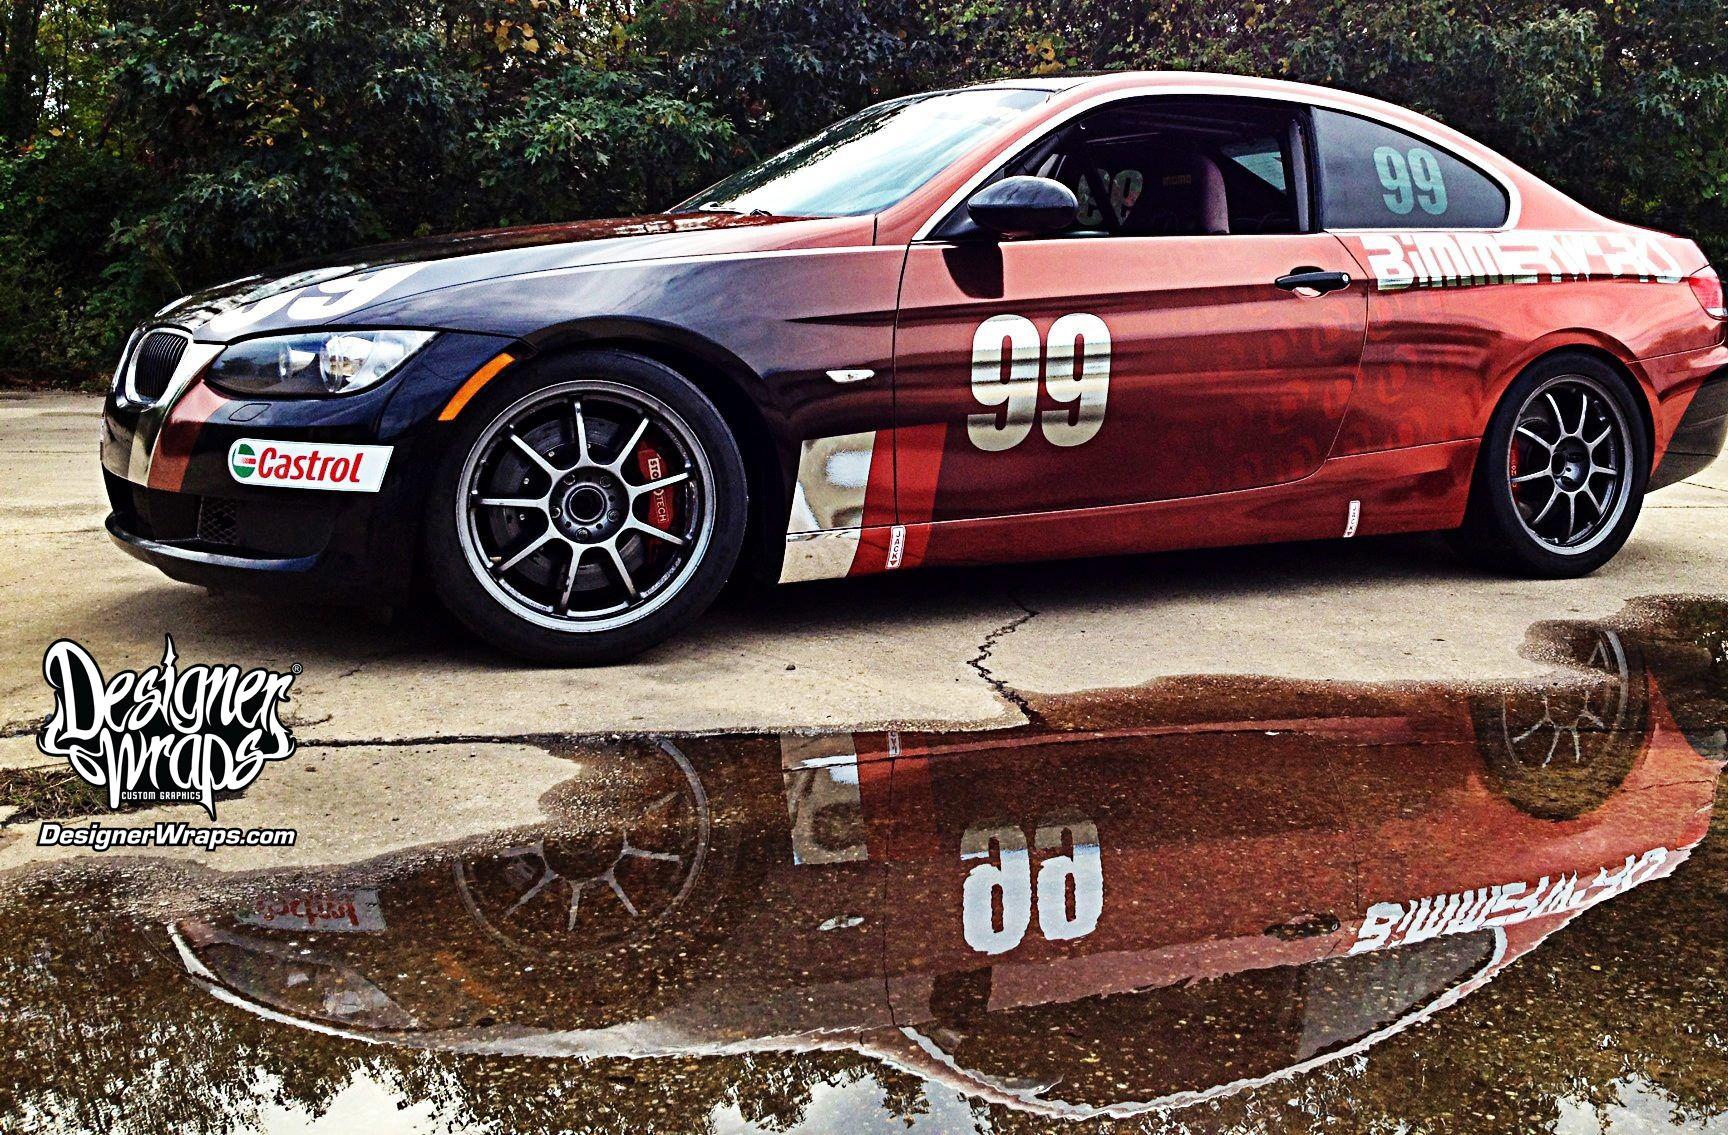 BMW Race Car Custom Faded Chrome Wrap Chrome Wraps Pinterest - Vinyl decals for race carsbmw race car wraps by graphios